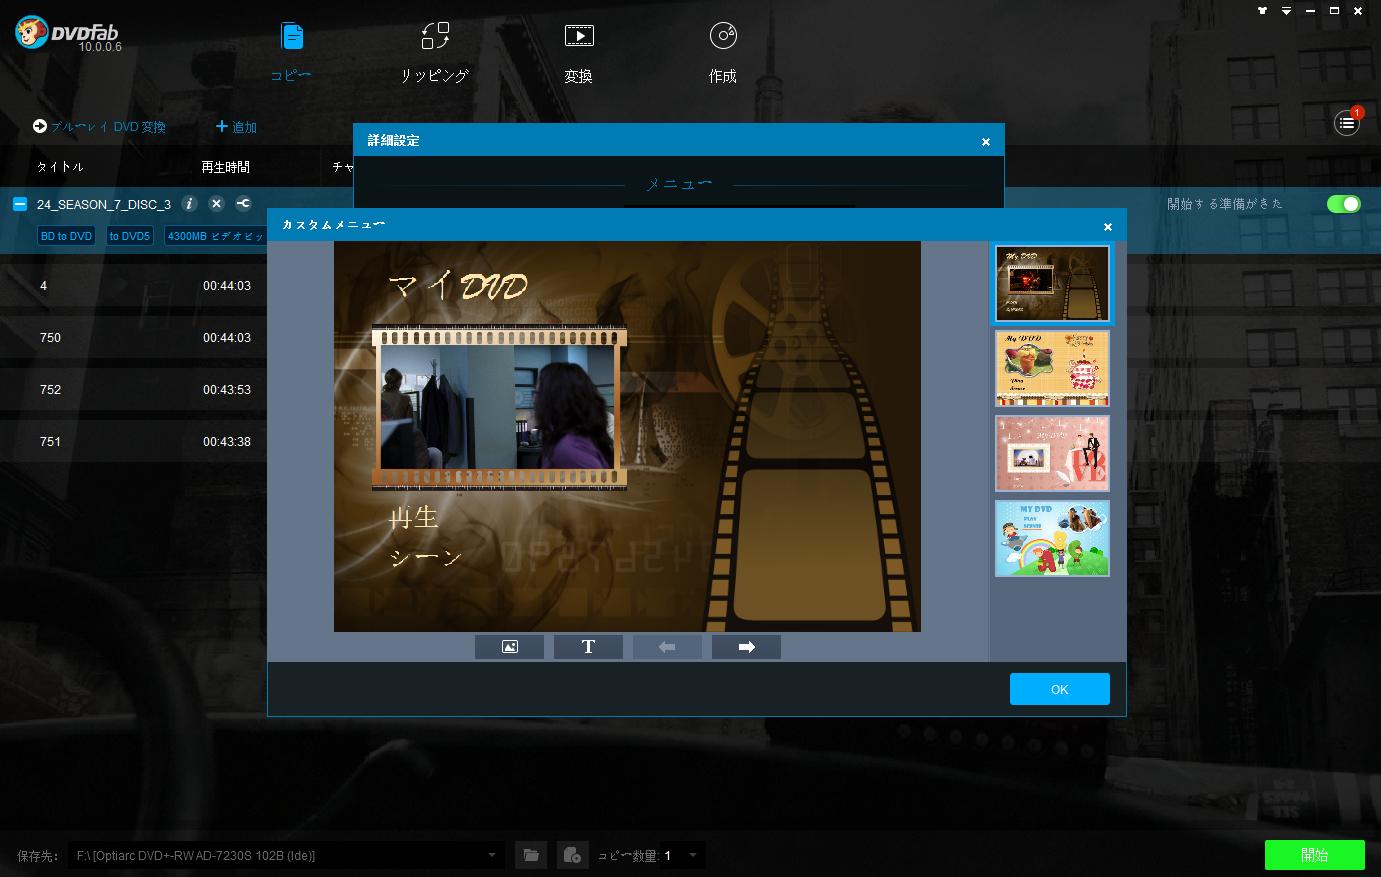 DVDfab ブルーレイ DVD 変換 スクリーンショット 3